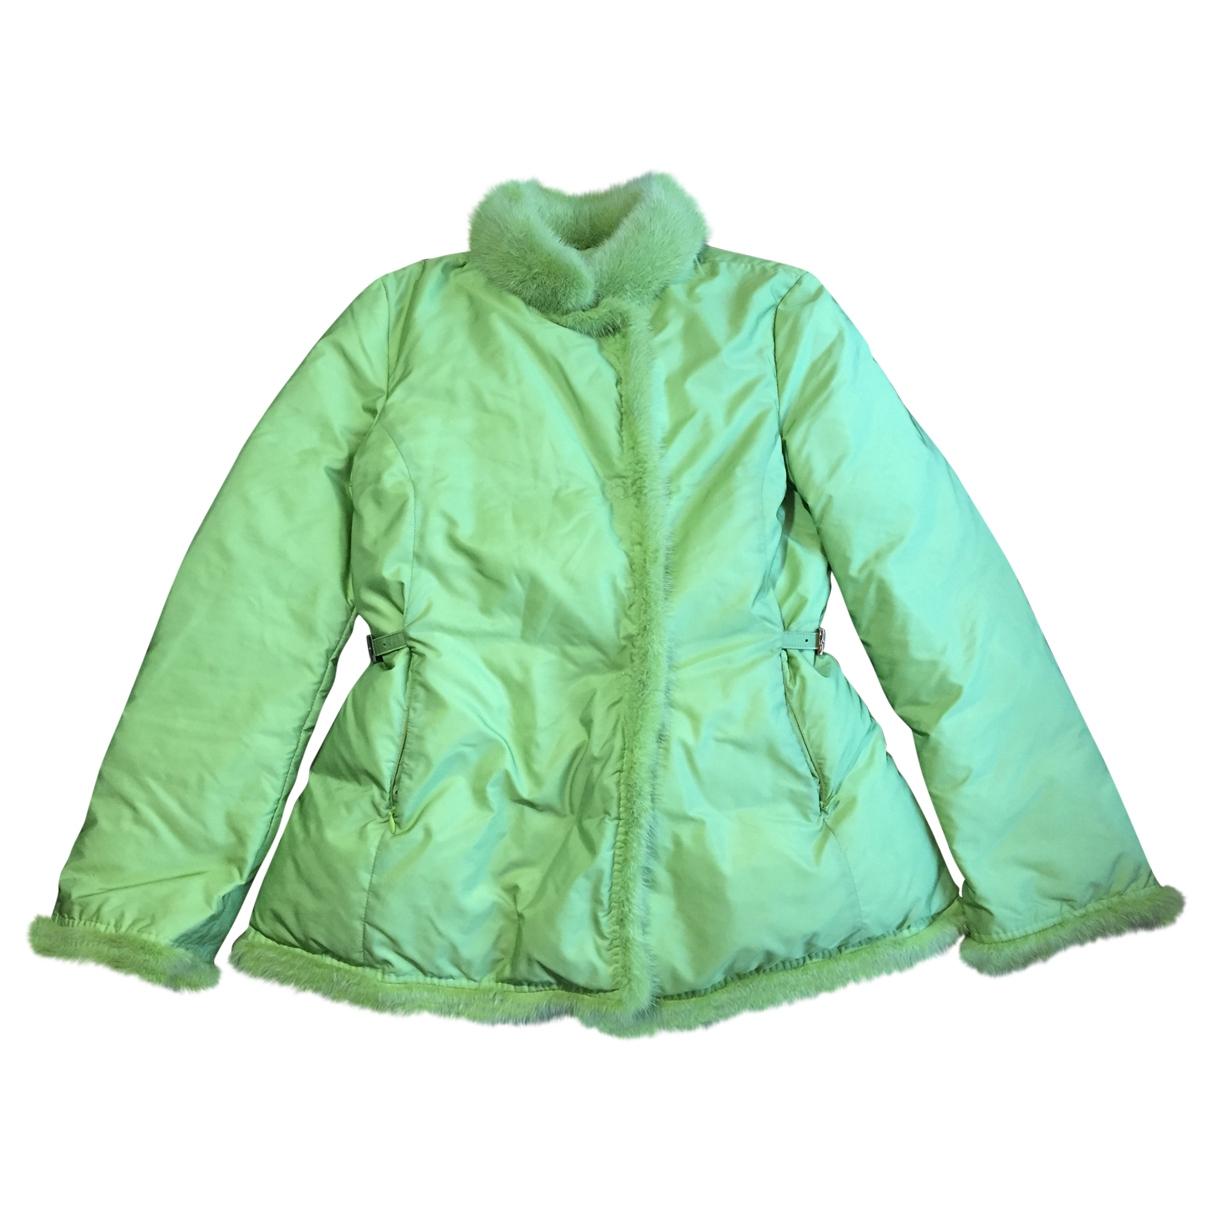 Ermanno Scervino \N Green jacket for Women 44 IT